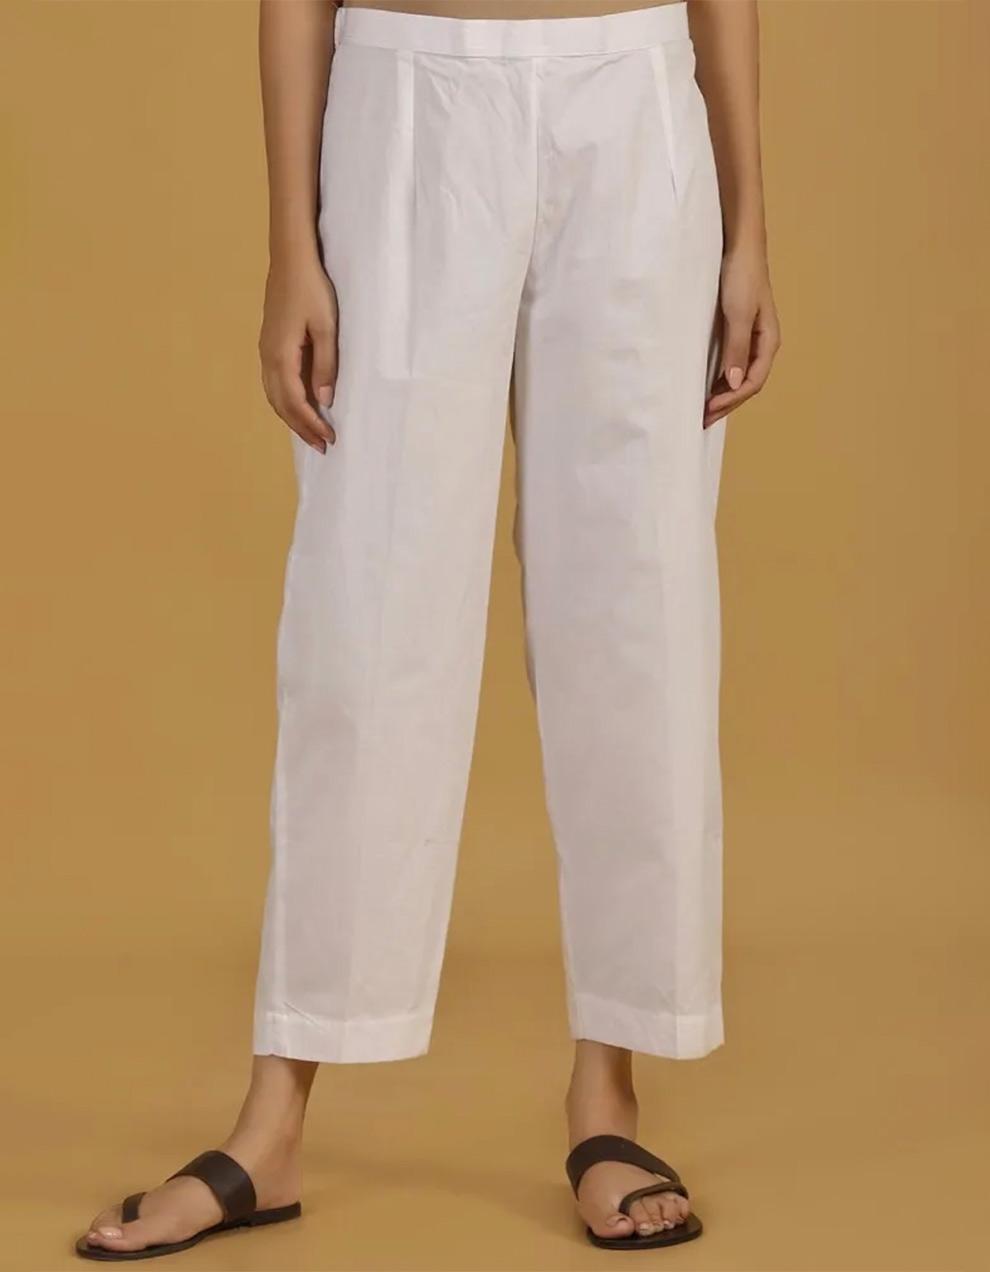 White cotton linen pant